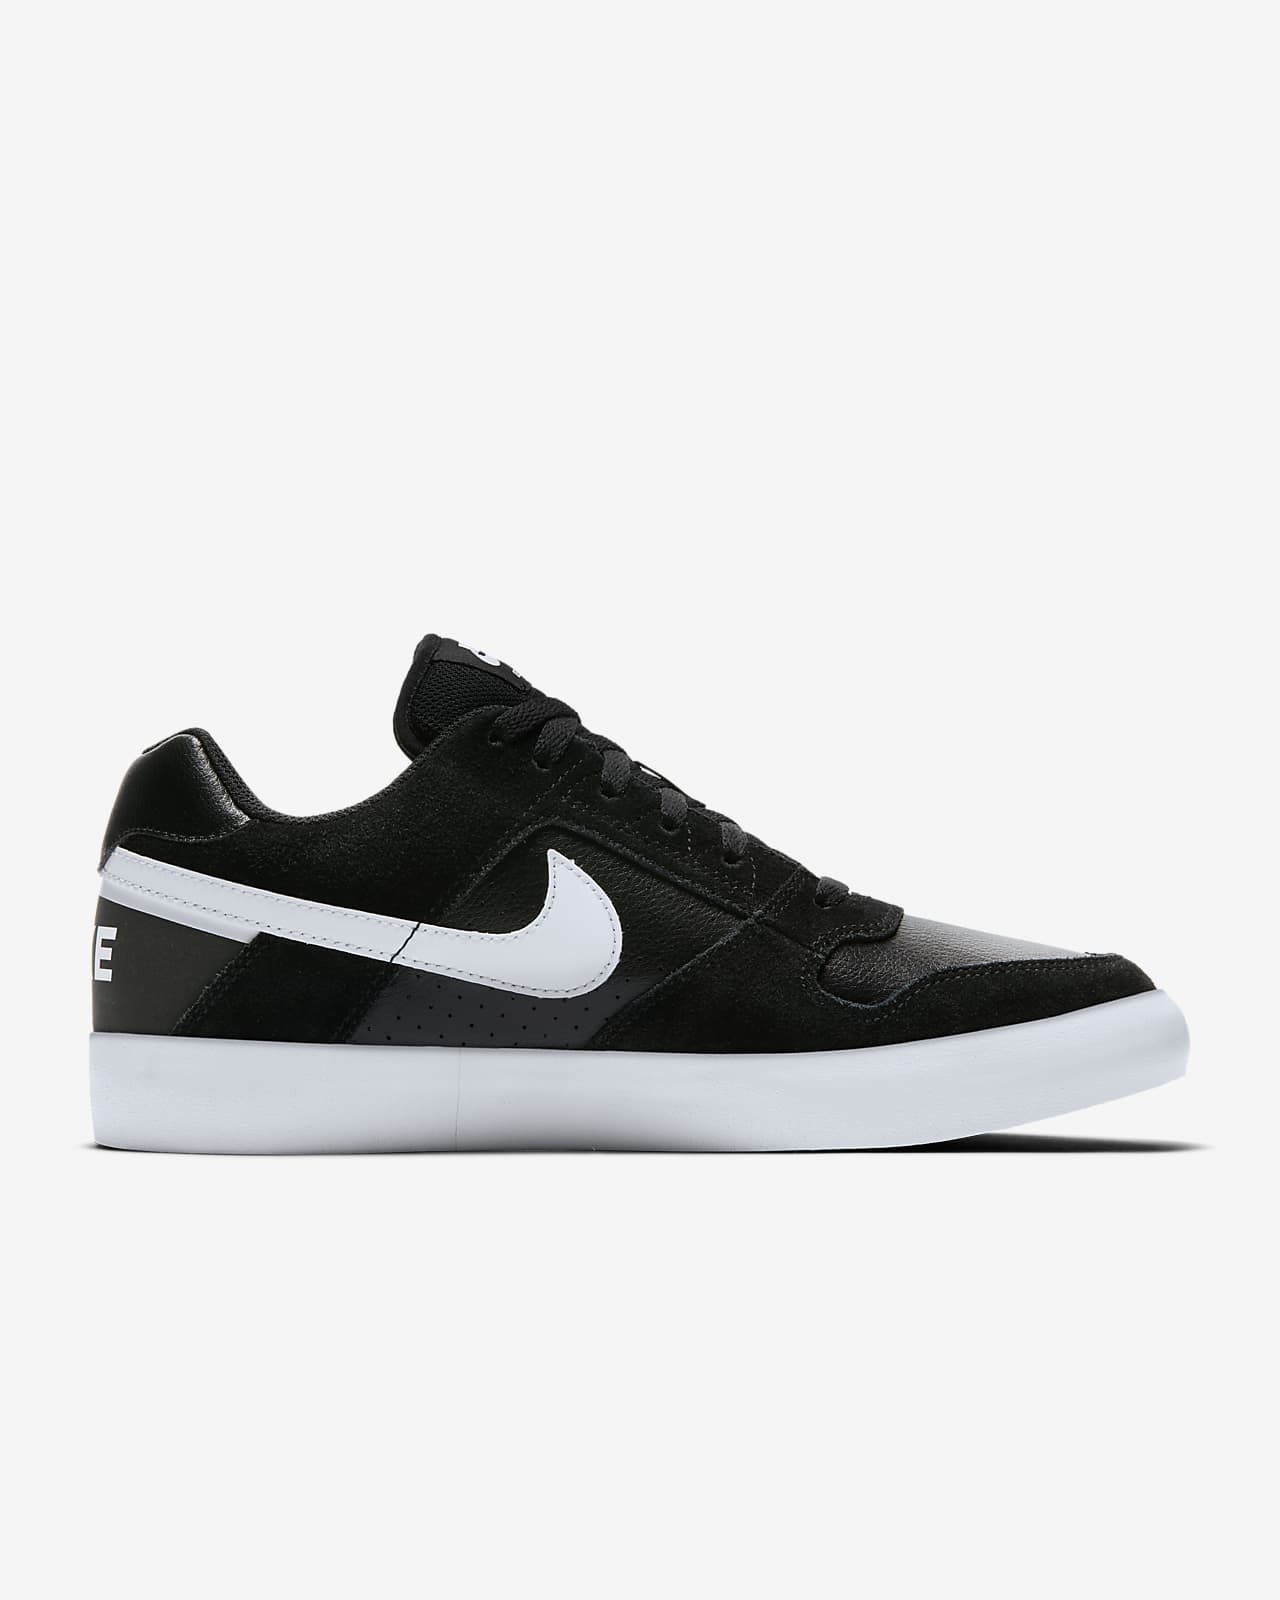 Nike SB Delta Force Vulc Men's Skate